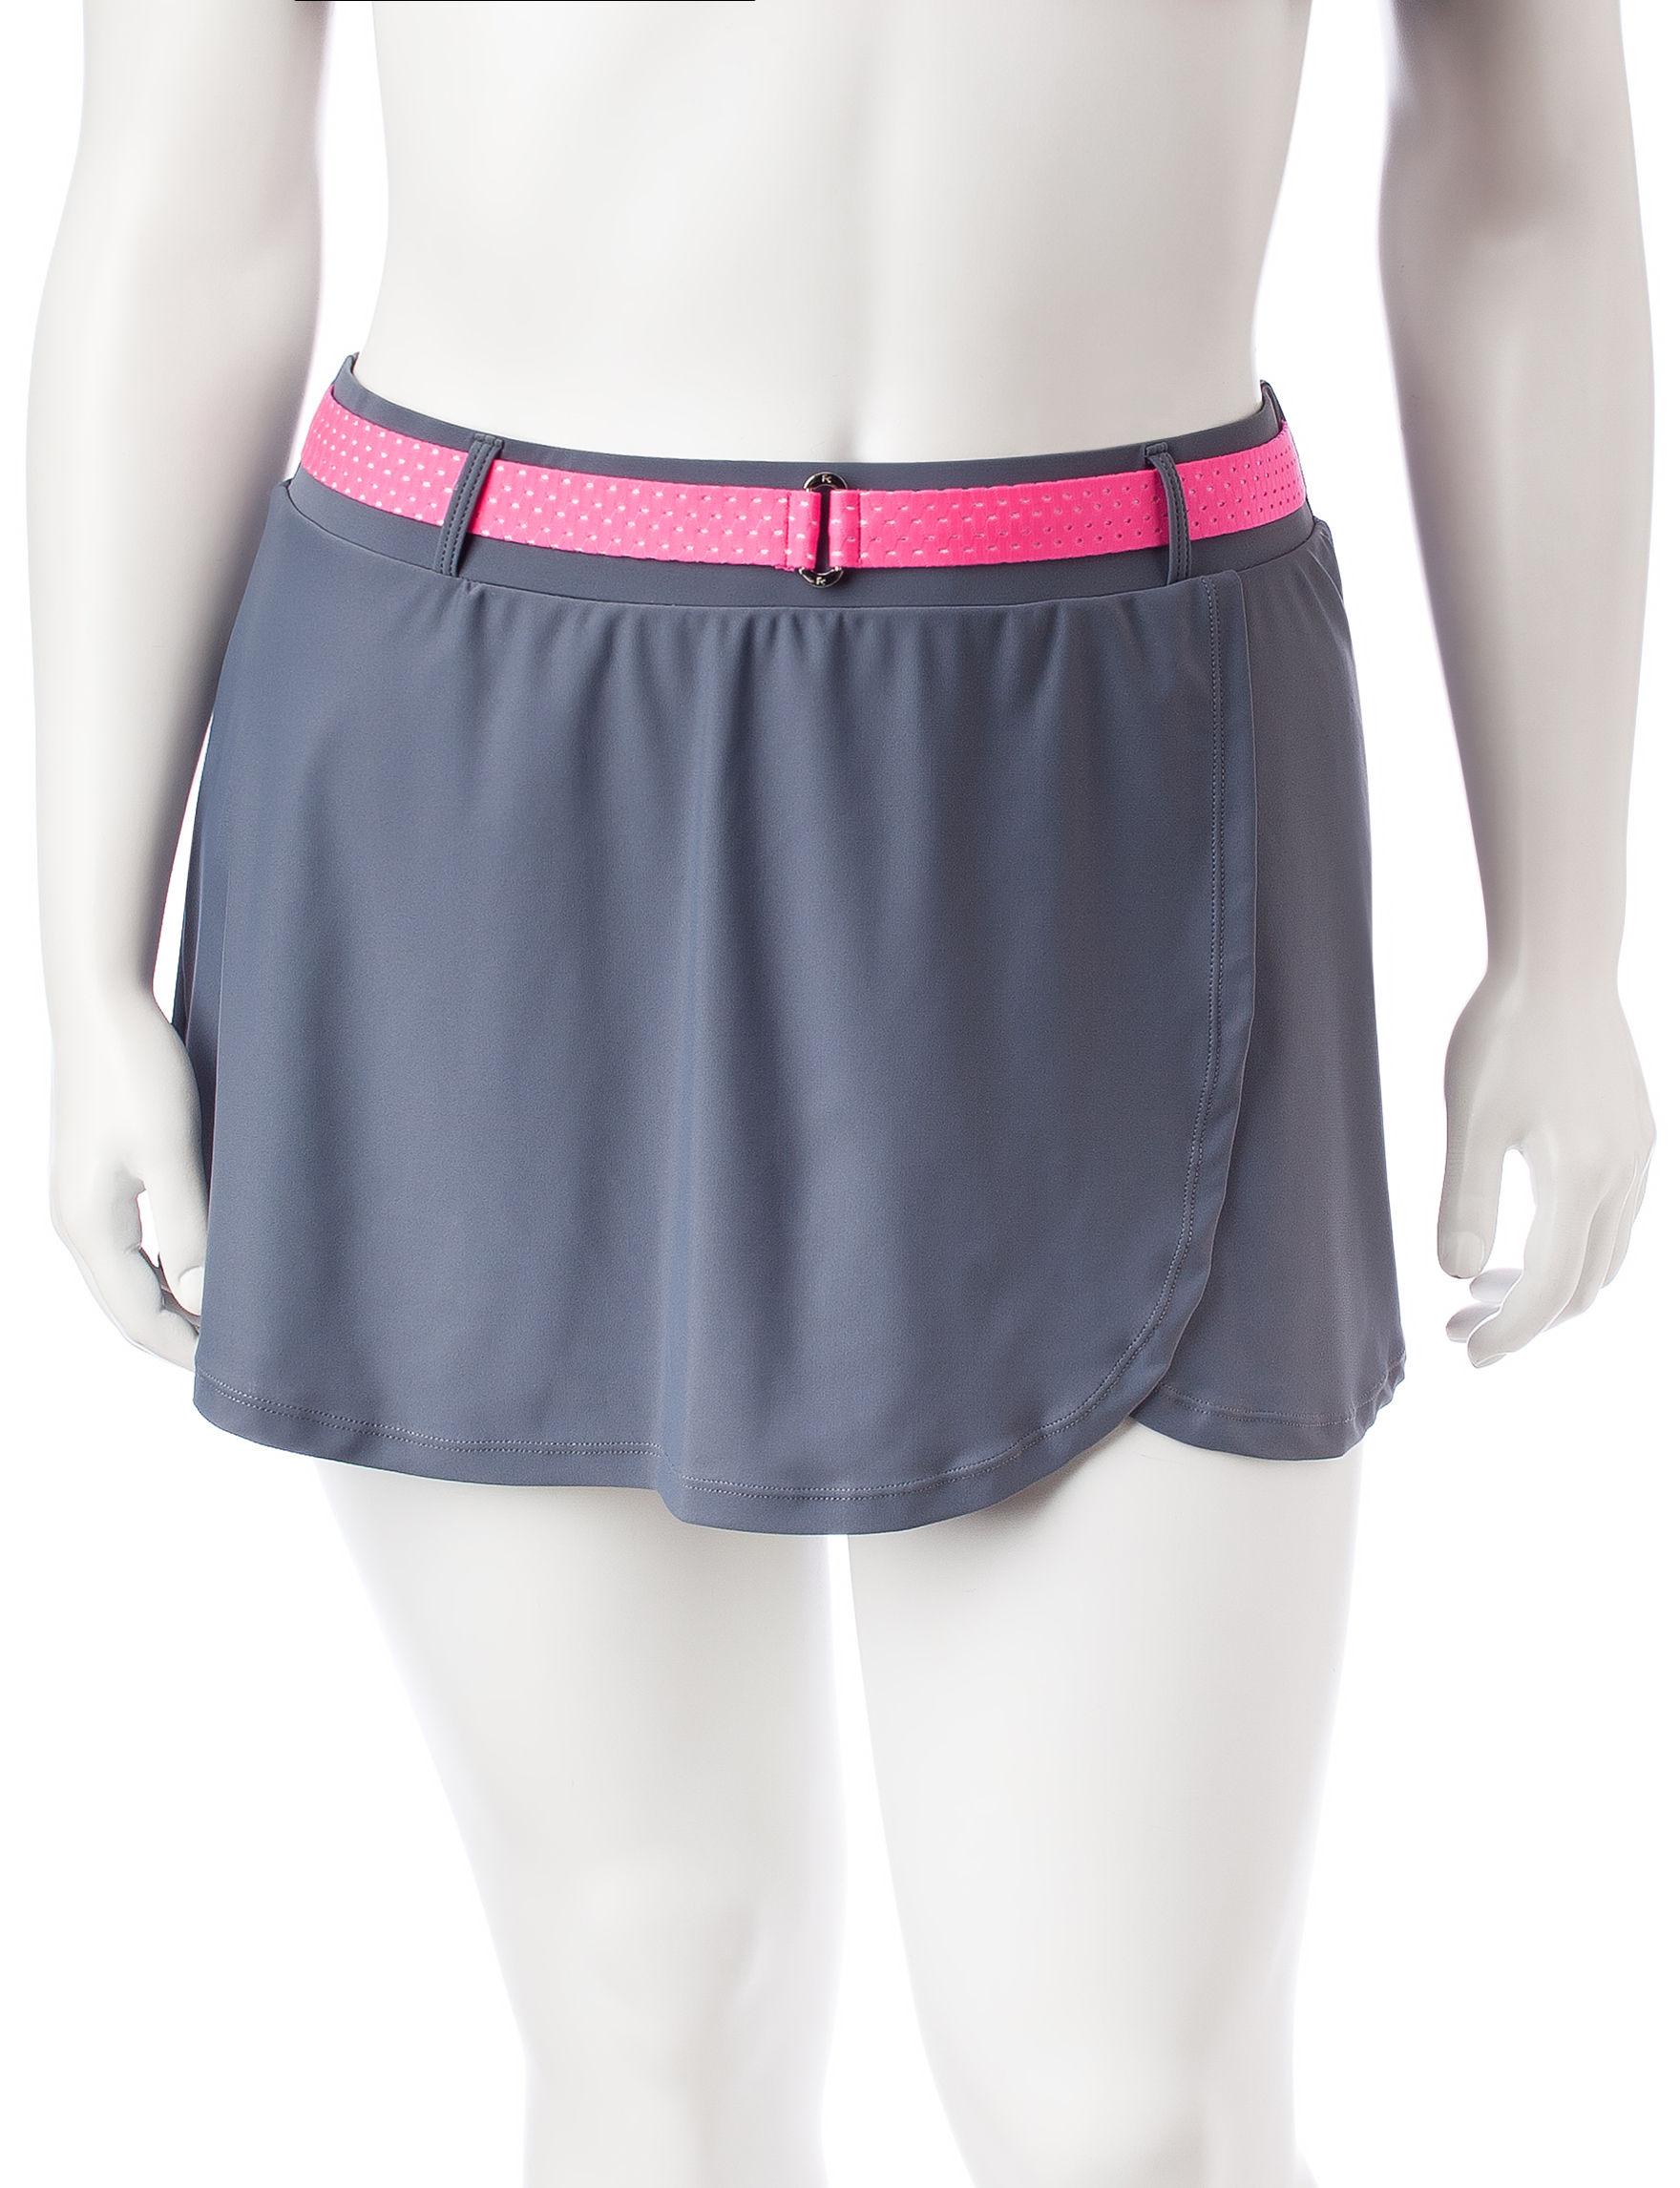 Free Country Grey / Pink Swimsuit Bottoms Boyshort